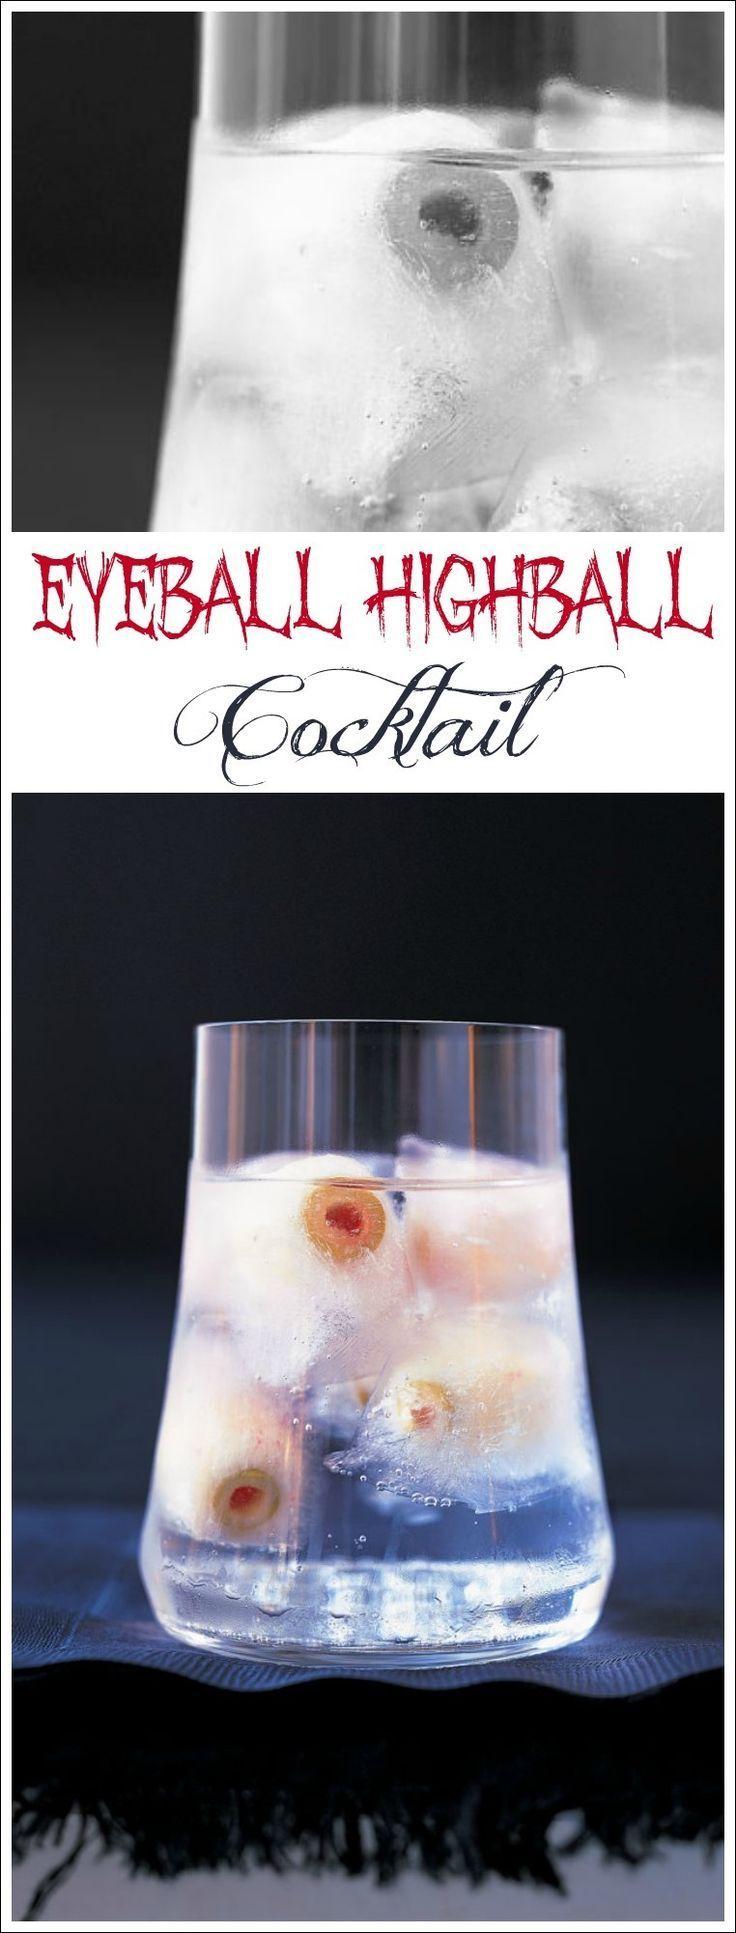 Eyeball Highball Cocktail for Halloween. Get this fun Halloween party cocktail recipe at This Mama Cooks! On a Diet